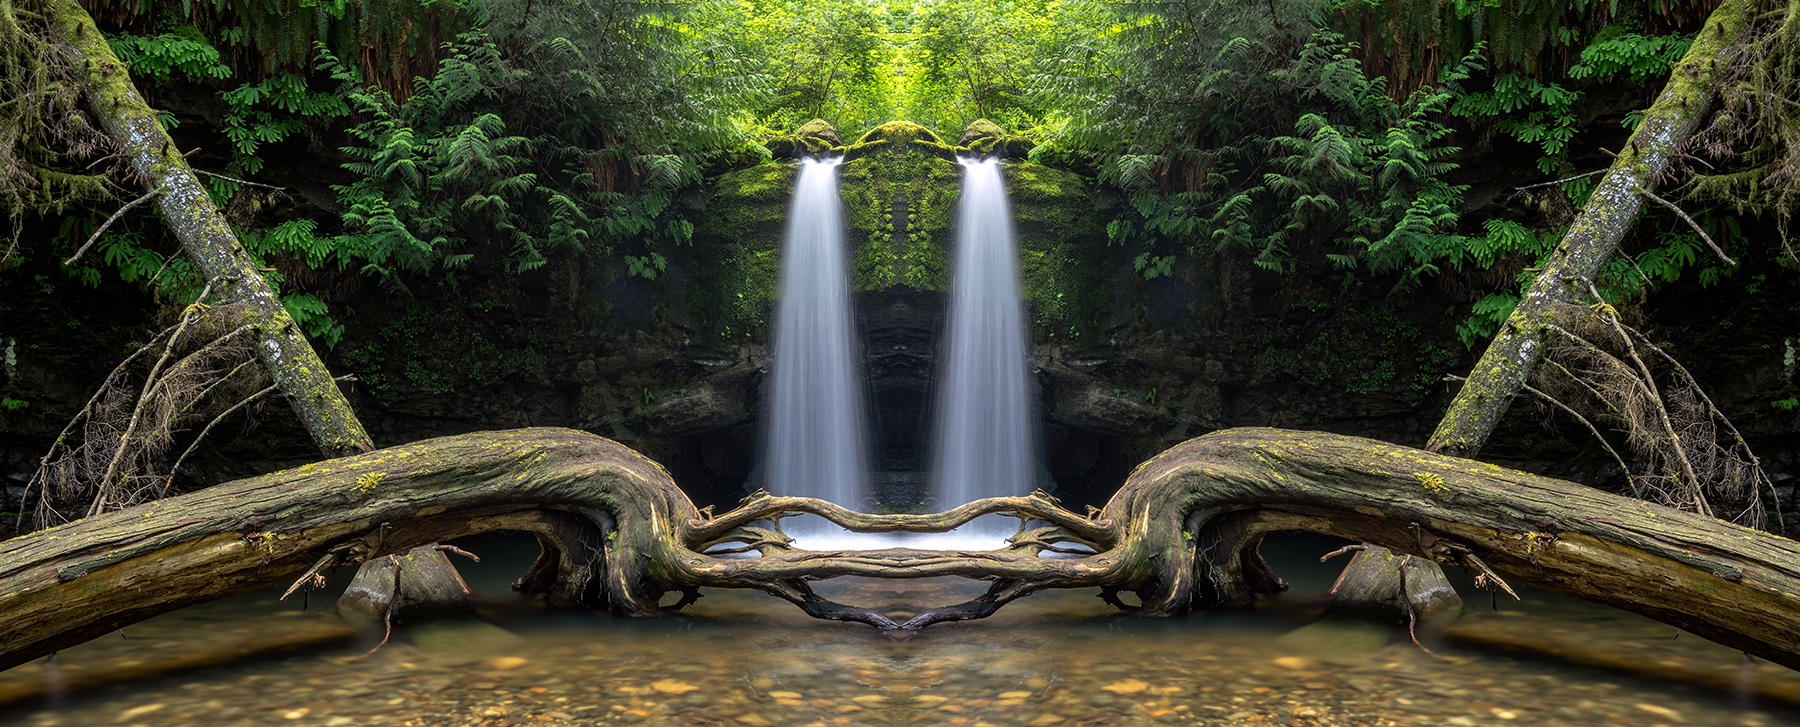 Stocking Creek Falls in the Fairy Dimension!